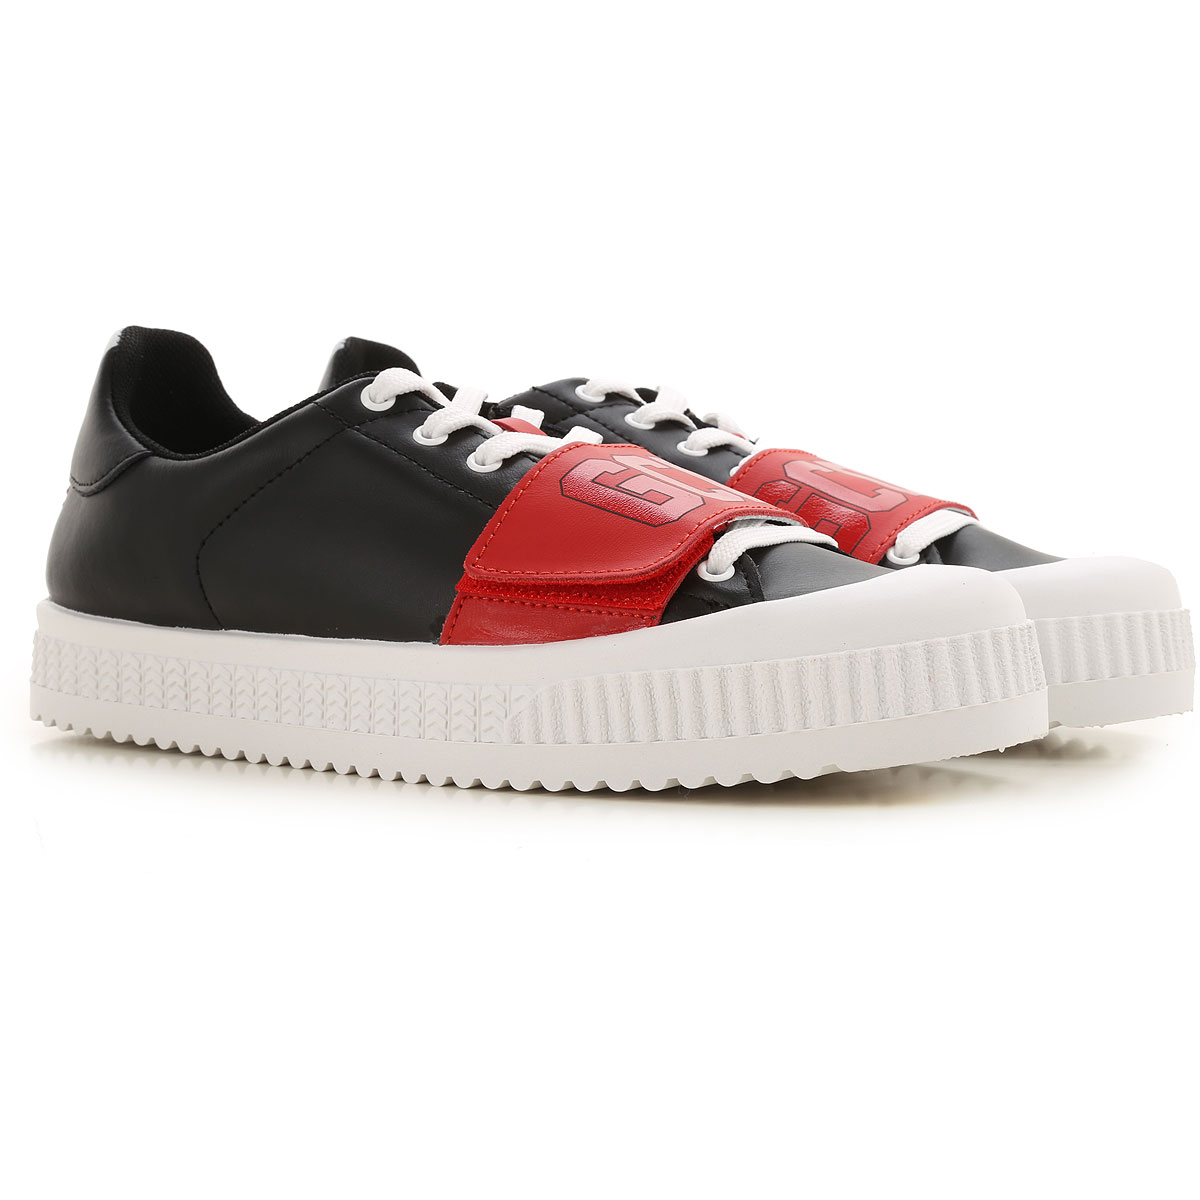 GCDS Sneaker Homme, Noir, Cuir, 2019, 39.5 40 40.5 41 41.5 42 42.5 43 43.5 44 45